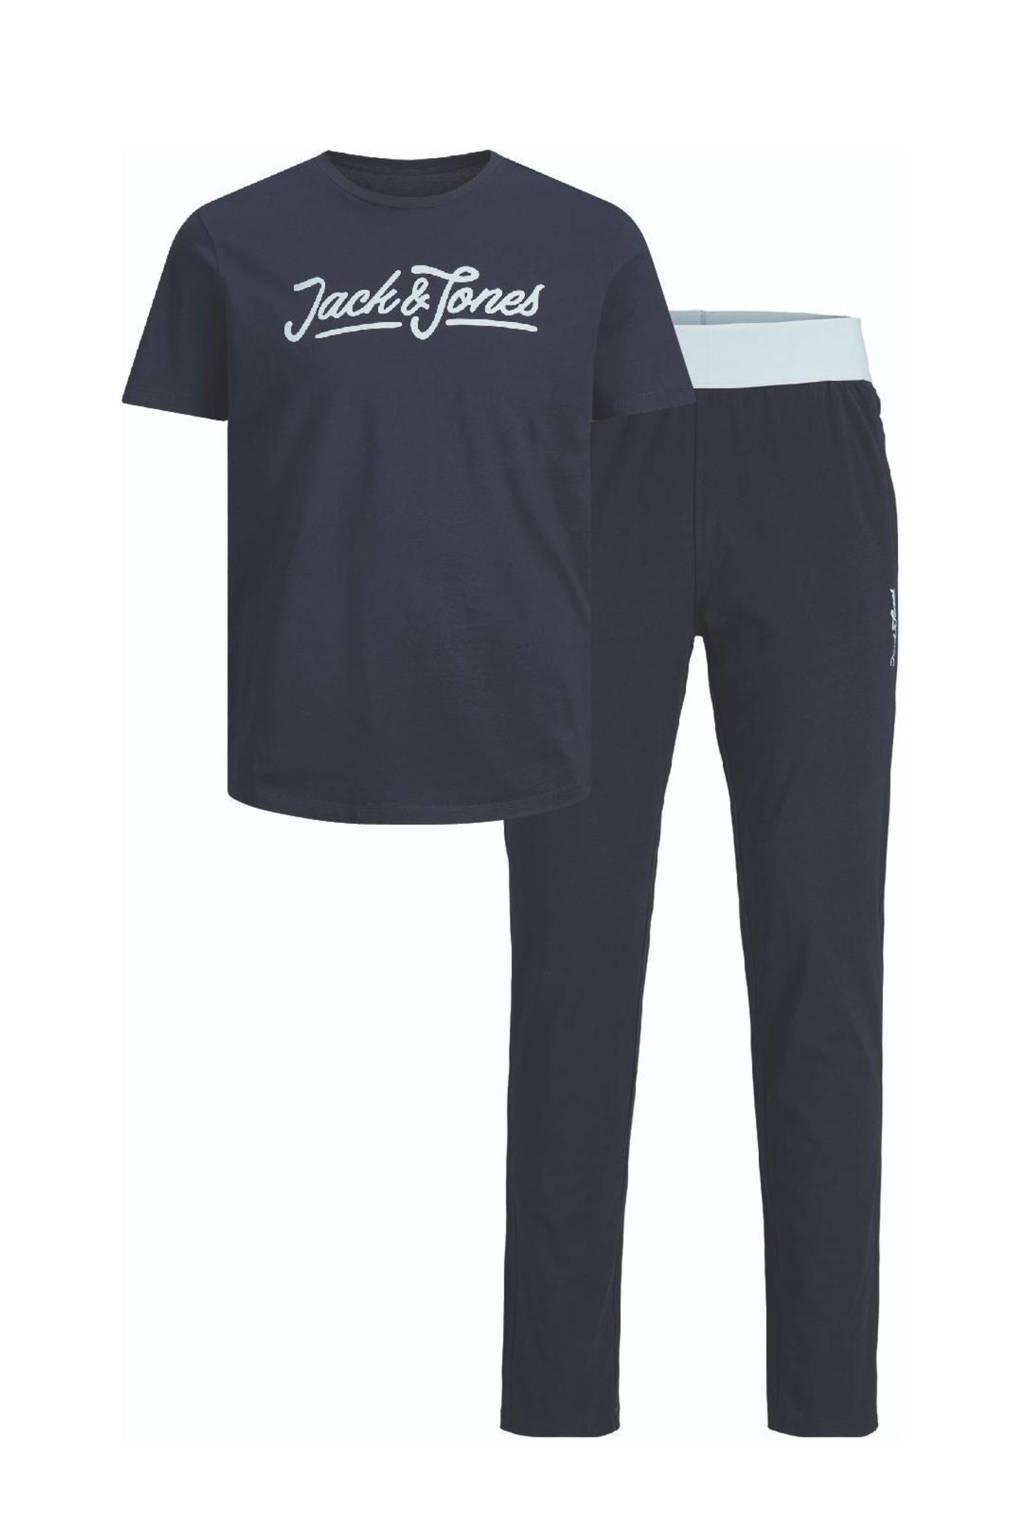 JACK & JONES JUNIOR T-shirt + loungebroek JACLOUNGE donkerblauw, Donkerblauw